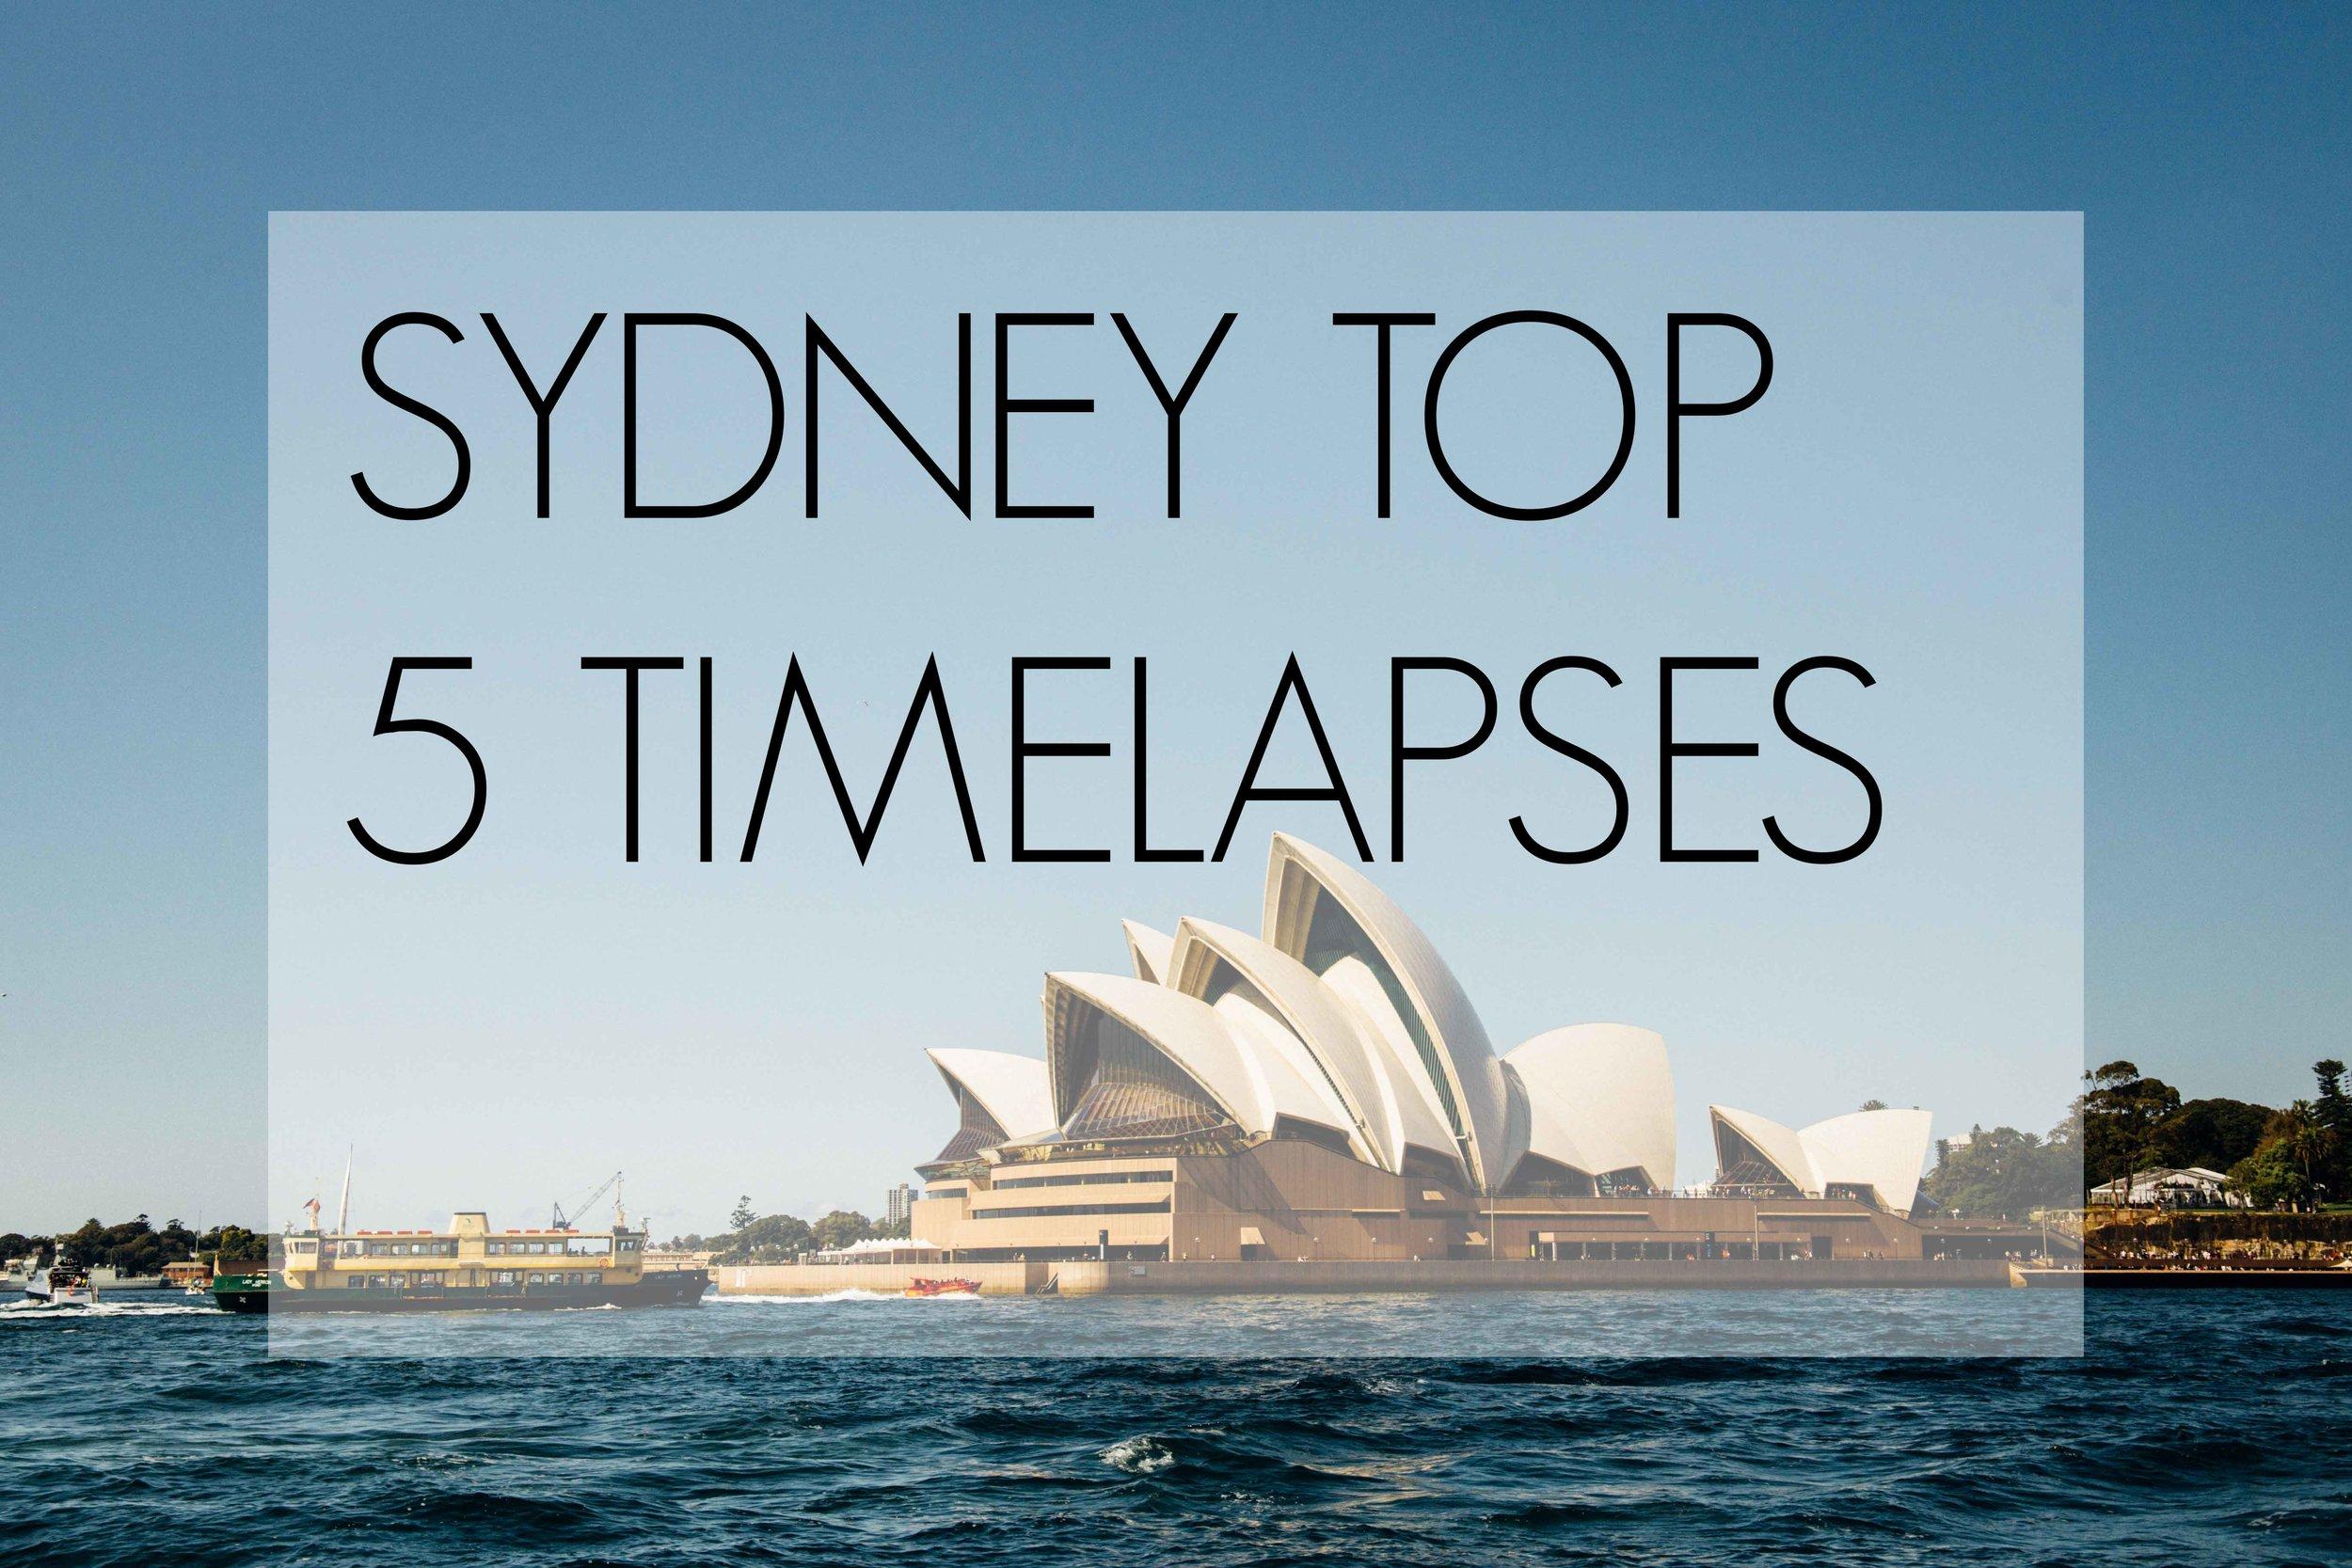 Sydney-Top-5-timelapses.jpg